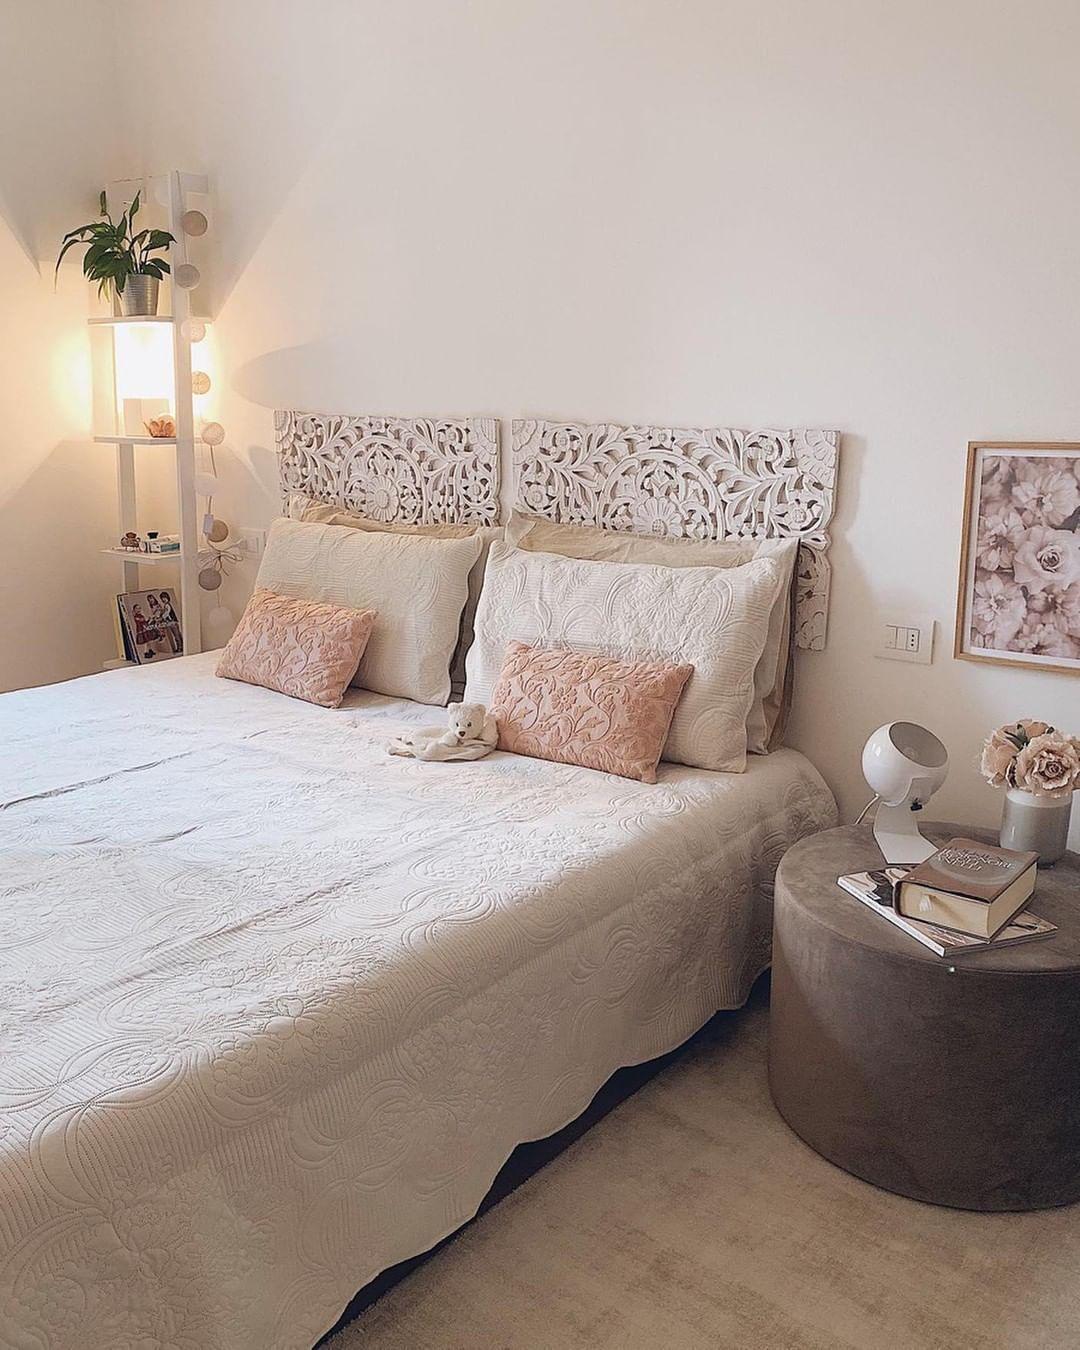 Westwing It On Instagram Come Comodino Scegliete Il Nostro Pouf Daisy Acquistatelo In Offerta Colorful Bedroom Decor Bedroom Inspirations Decor